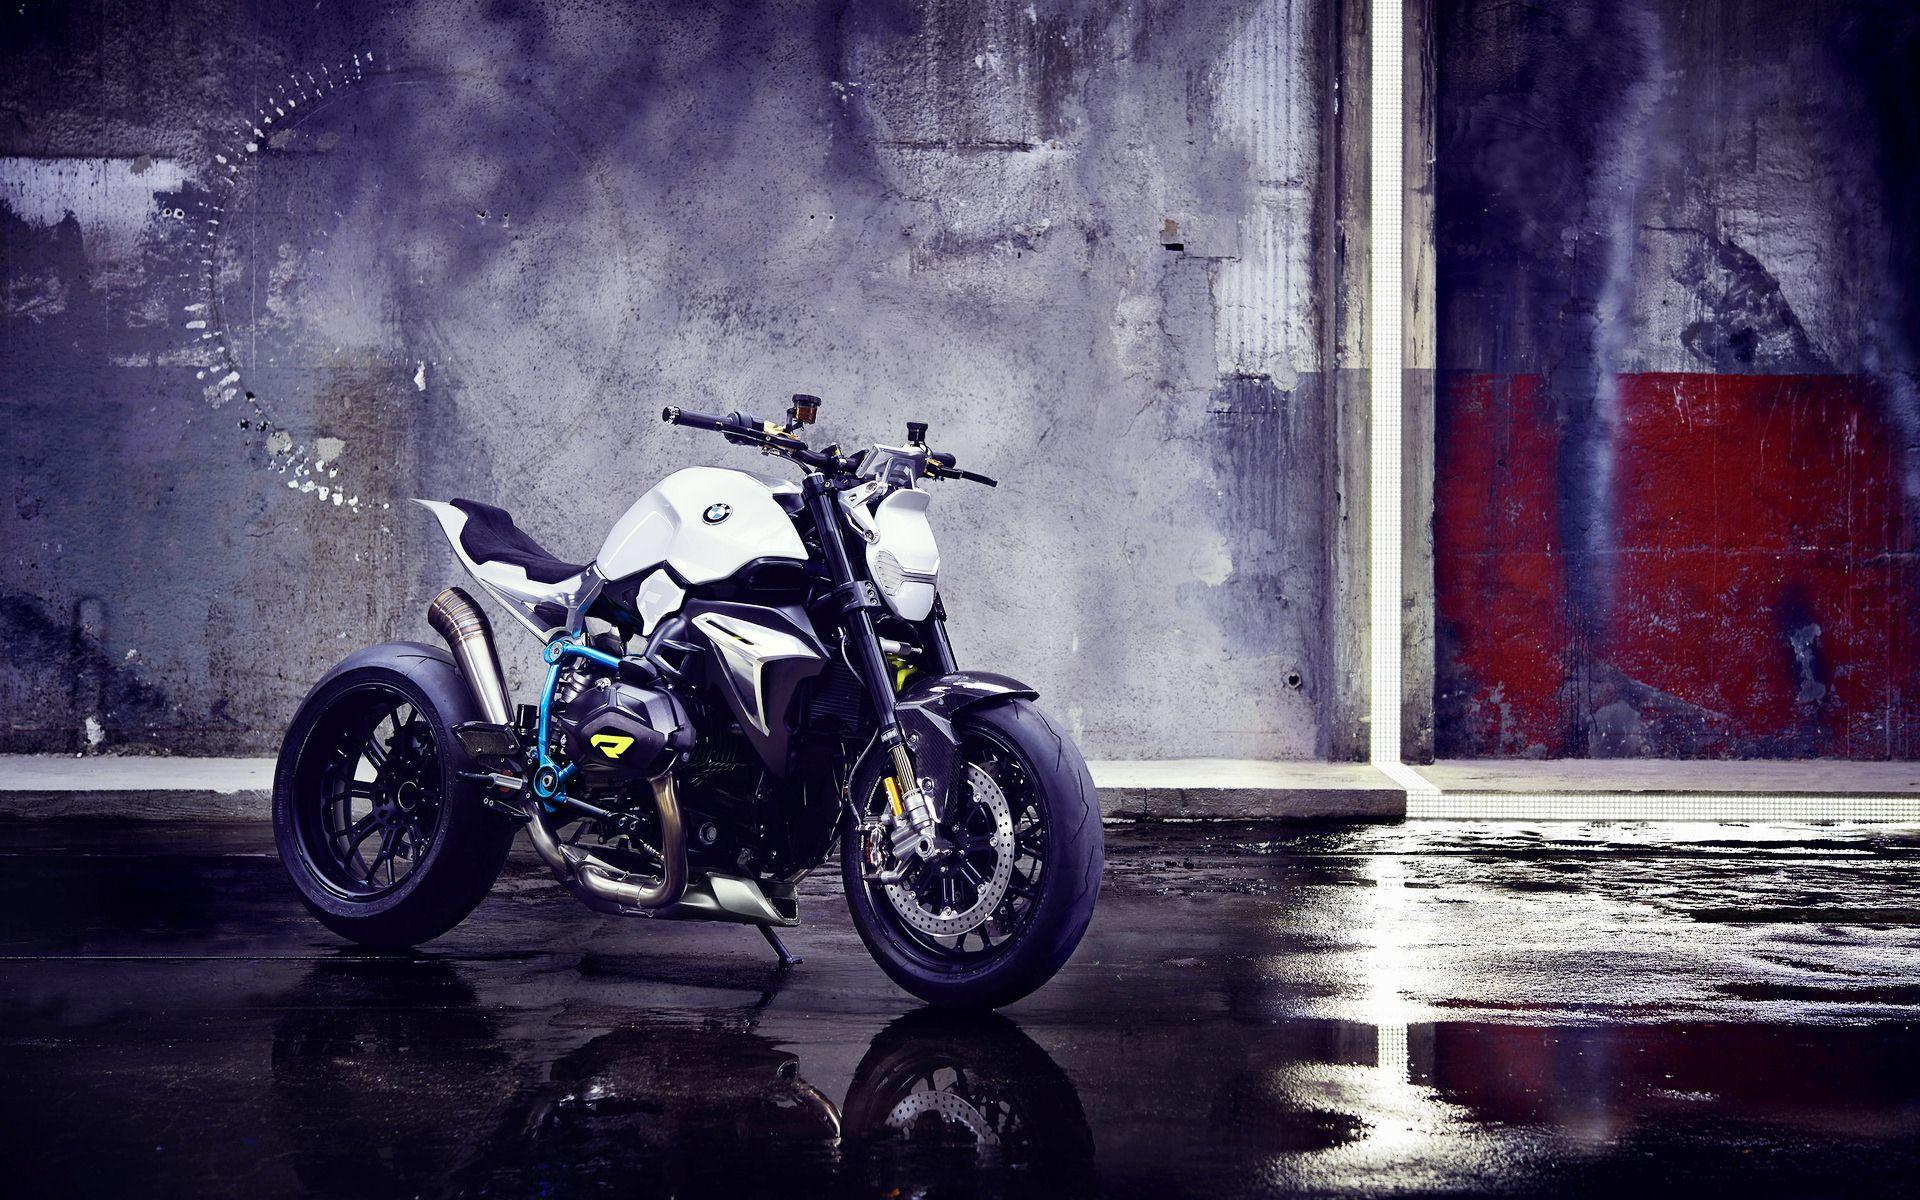 Bmw Moto Hd Wallpapers Hd Car Wallpapers: 15 Fantastic HD BMW Wallpapers